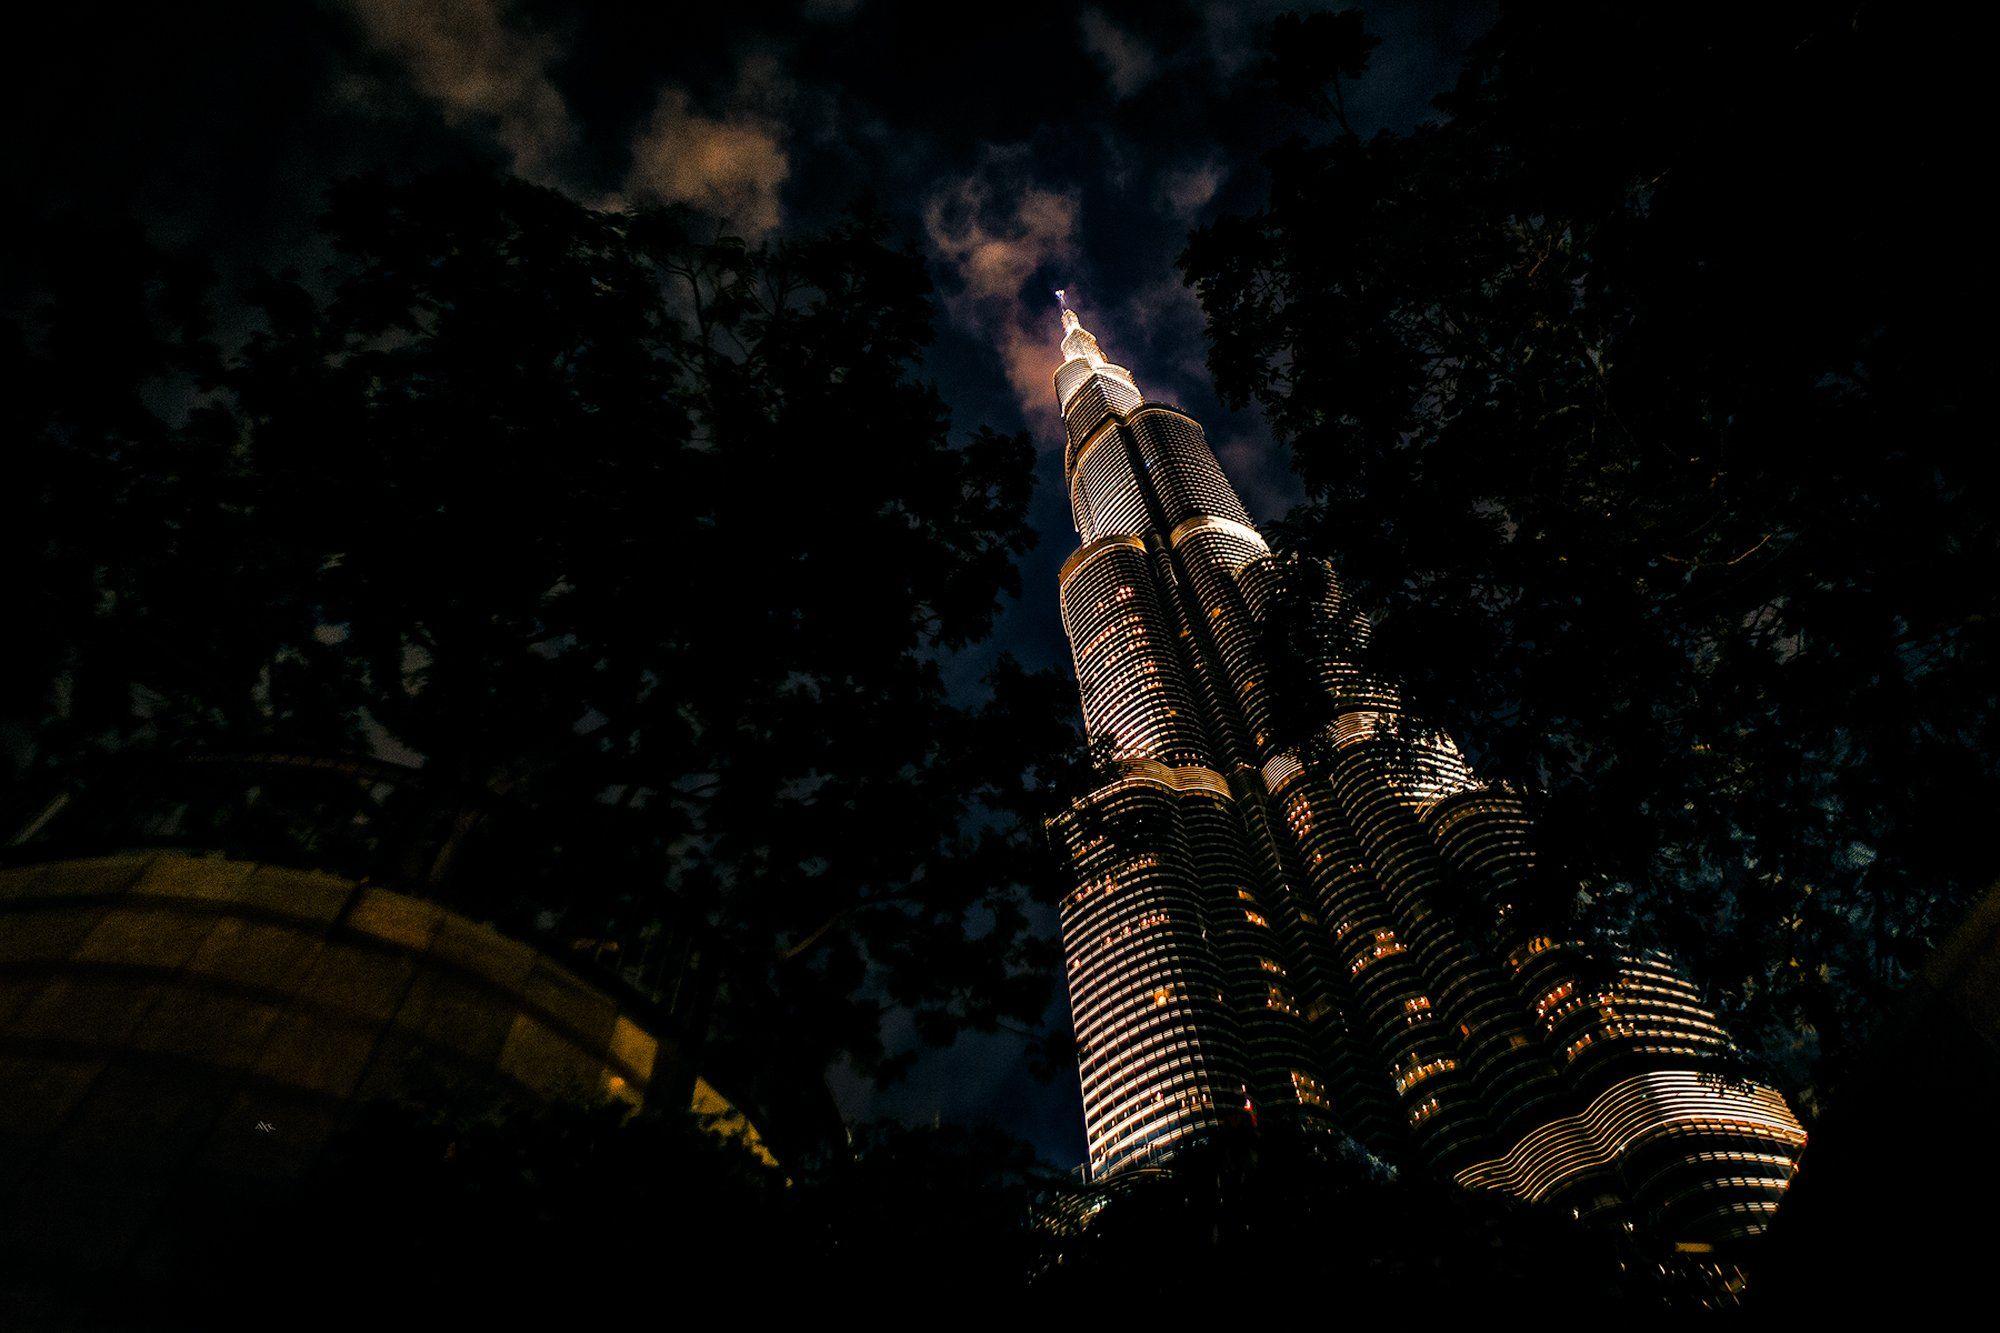 city, night, light, burj-kgalifa, uae, Руслан Болгов (Axe)